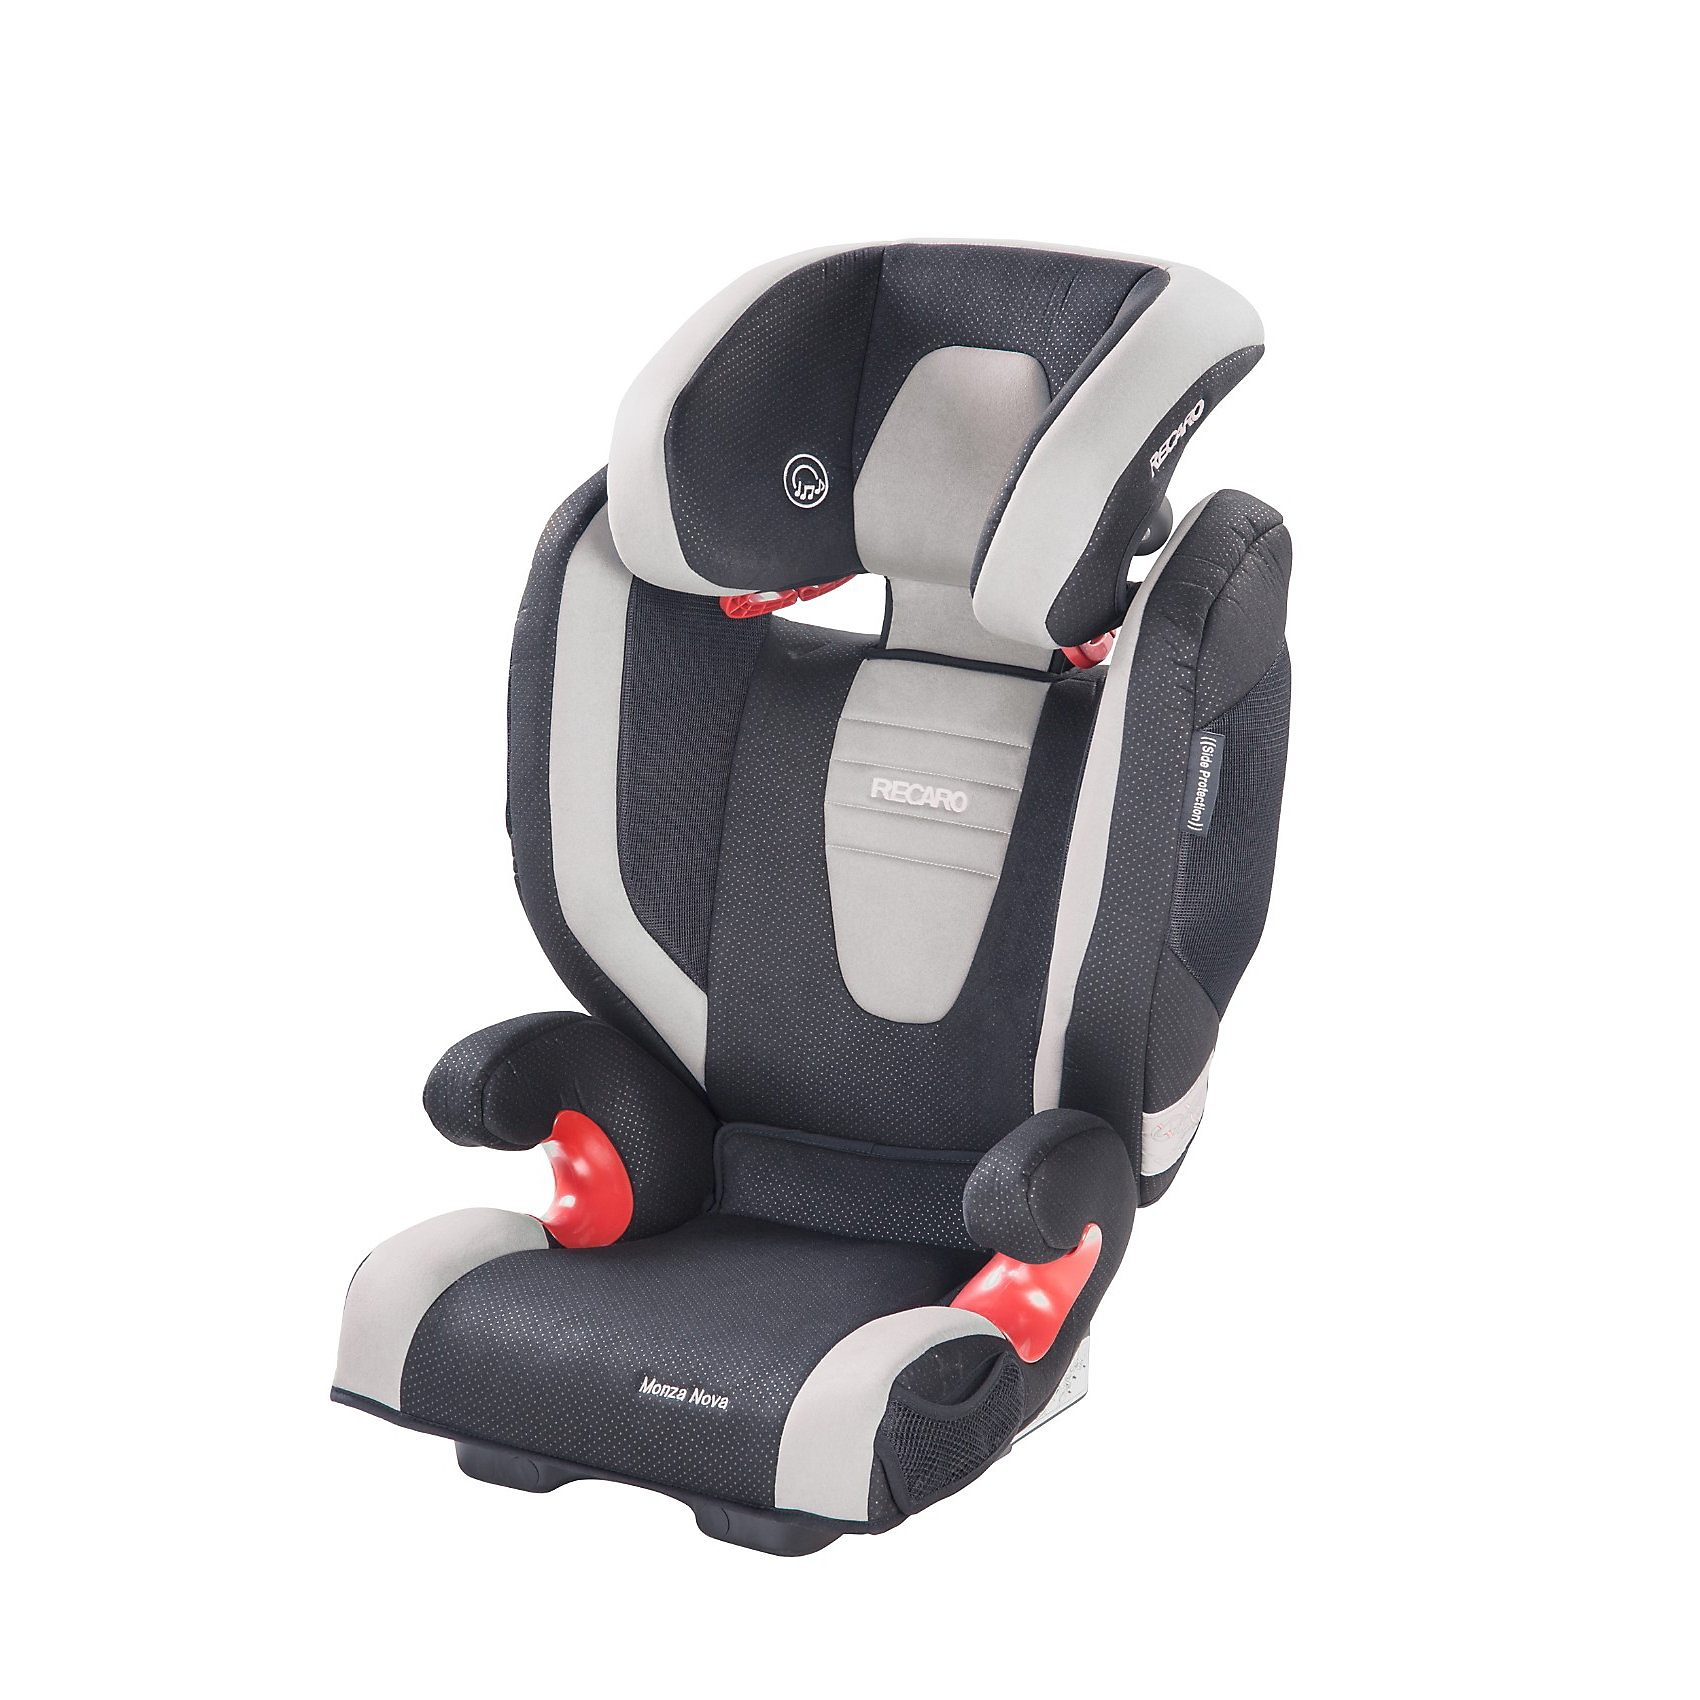 RECARO Auto-Kindersitz Monza Nova 2, Graphite